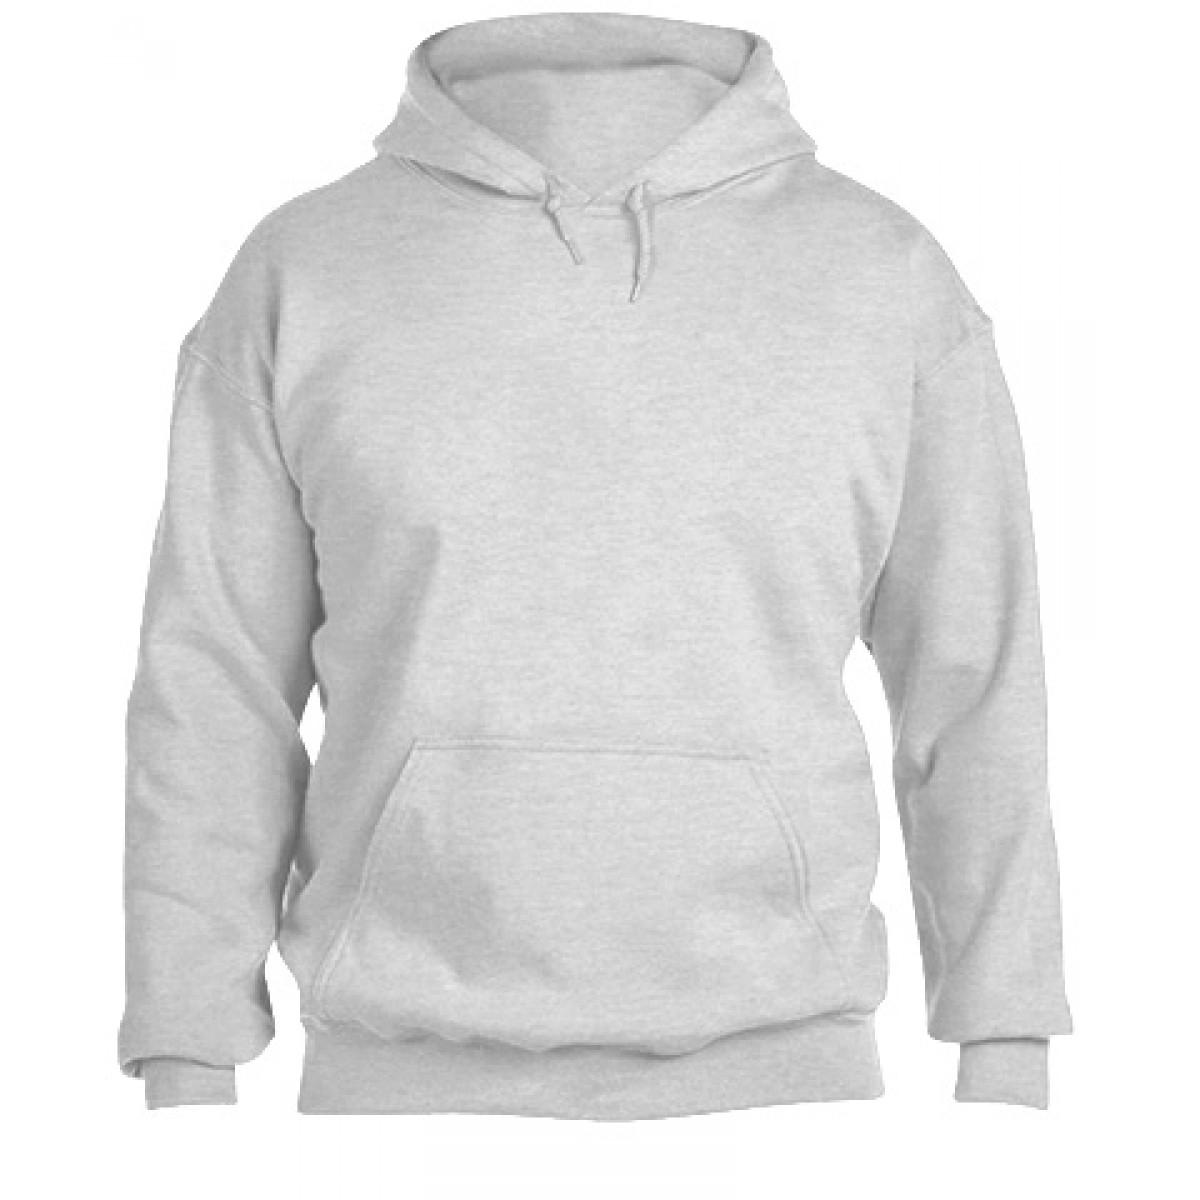 Hooded Sweatshirt 50/50 Heavy Blend-Ash Gray-XS